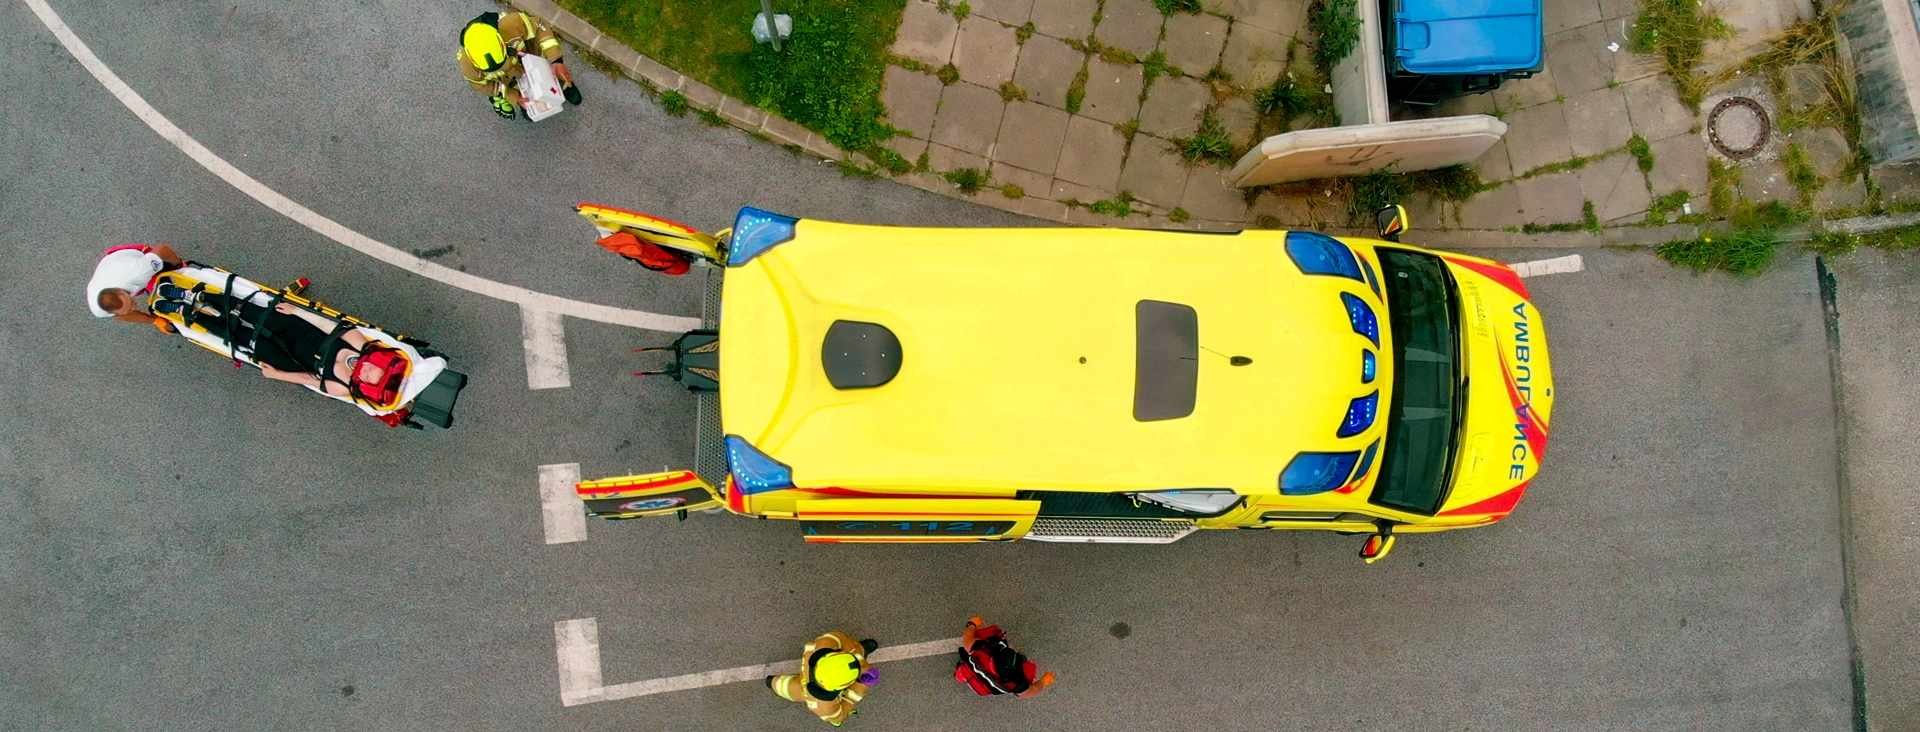 Ambulance USA - Advantages- Air Ambulance | Global Medical Response | International Emergency Medical Services| Non-Emergency Ambulance Transportation | EMS Transportation